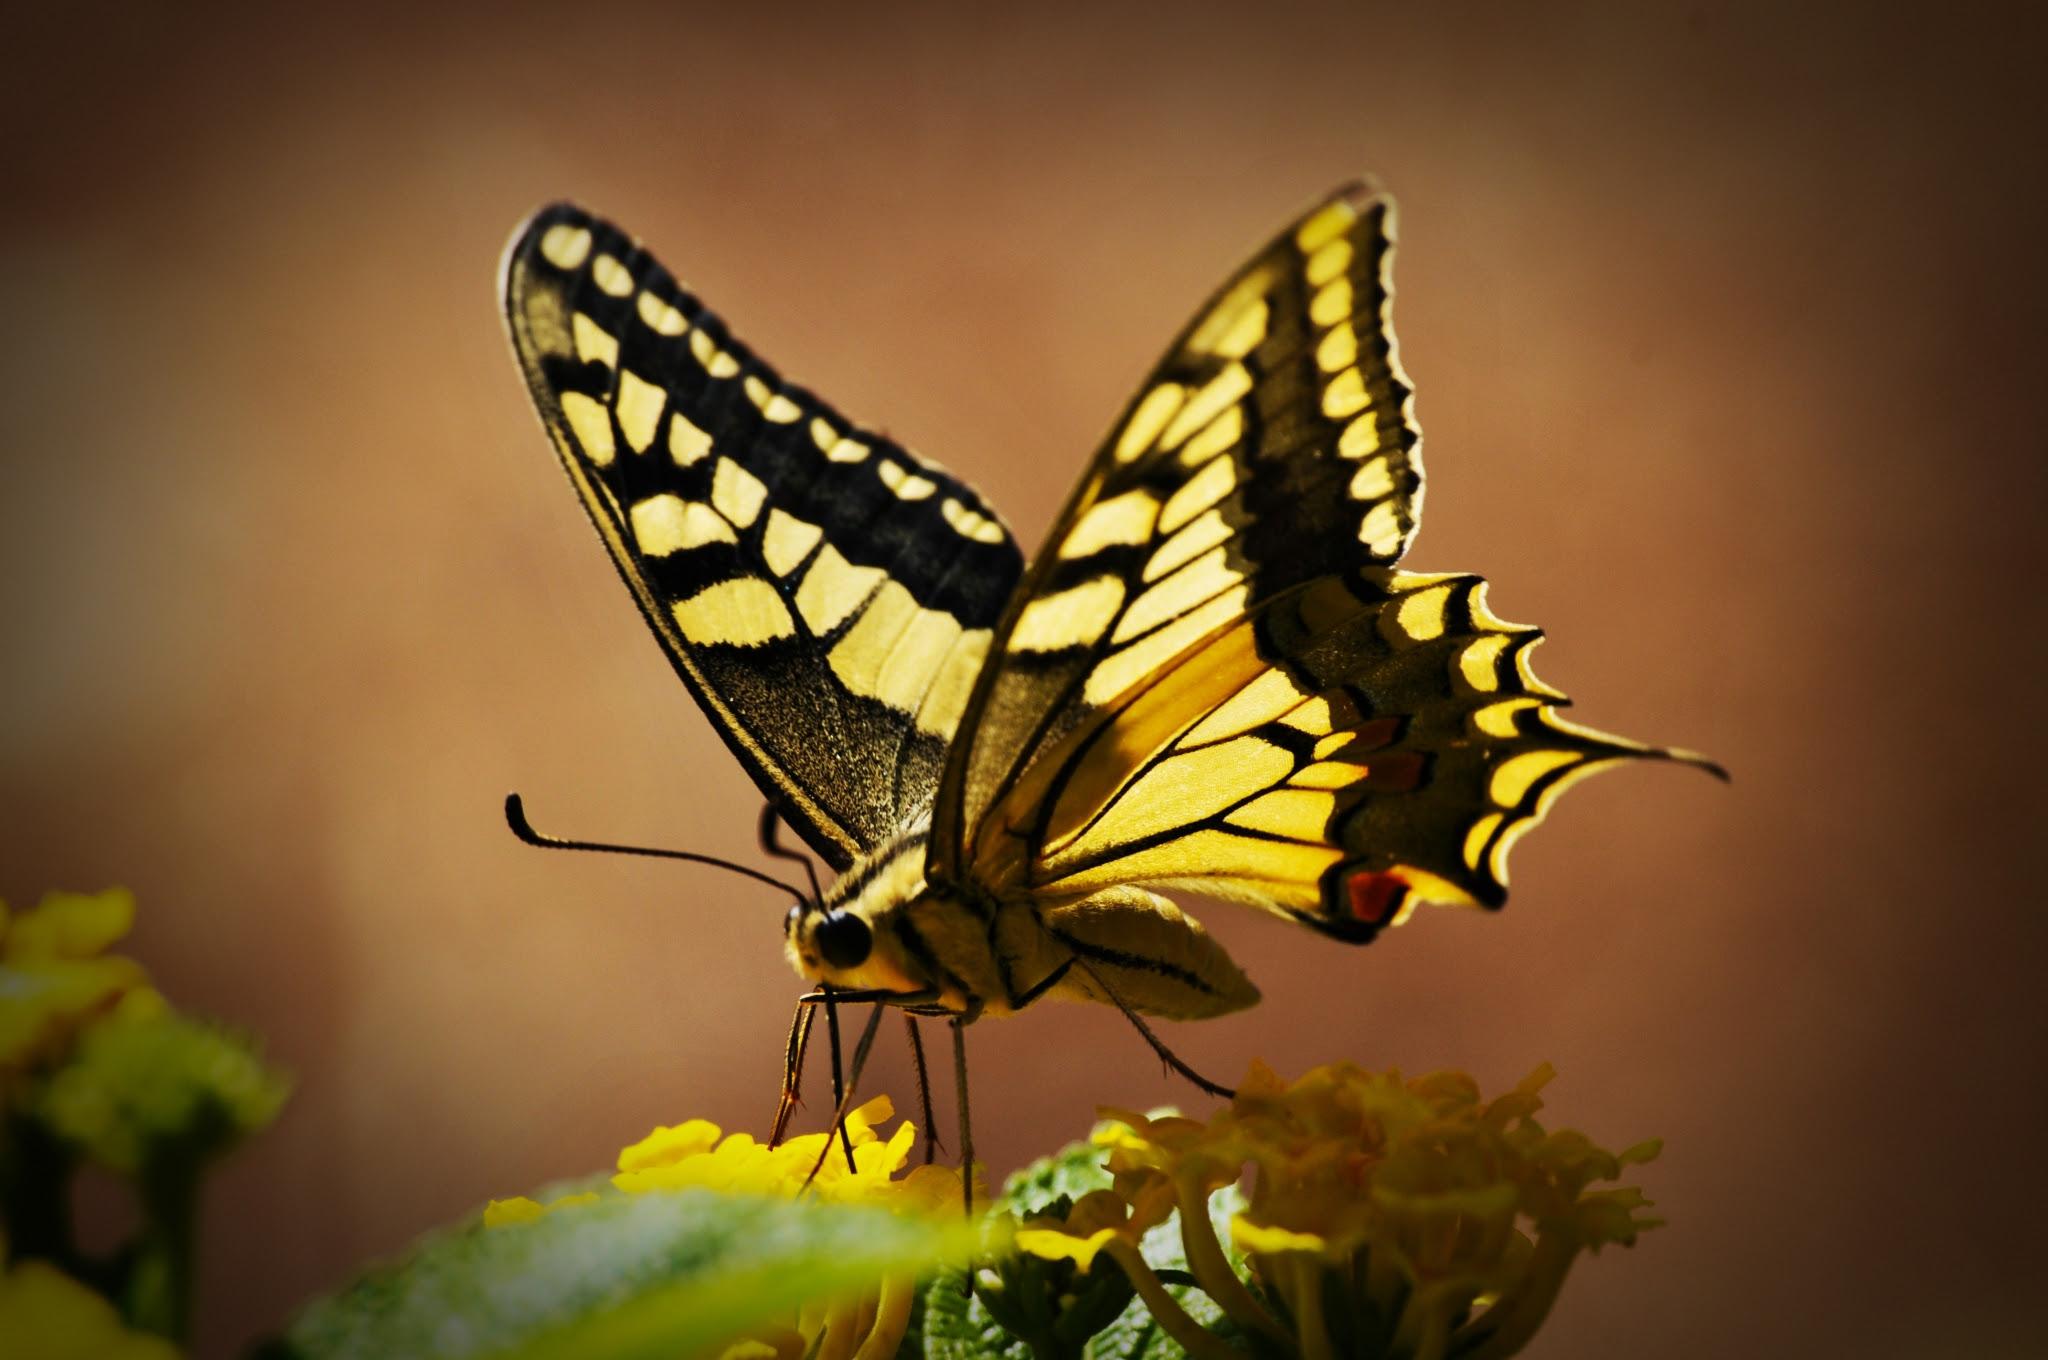 butterfly hd wallpapers 1080p windows